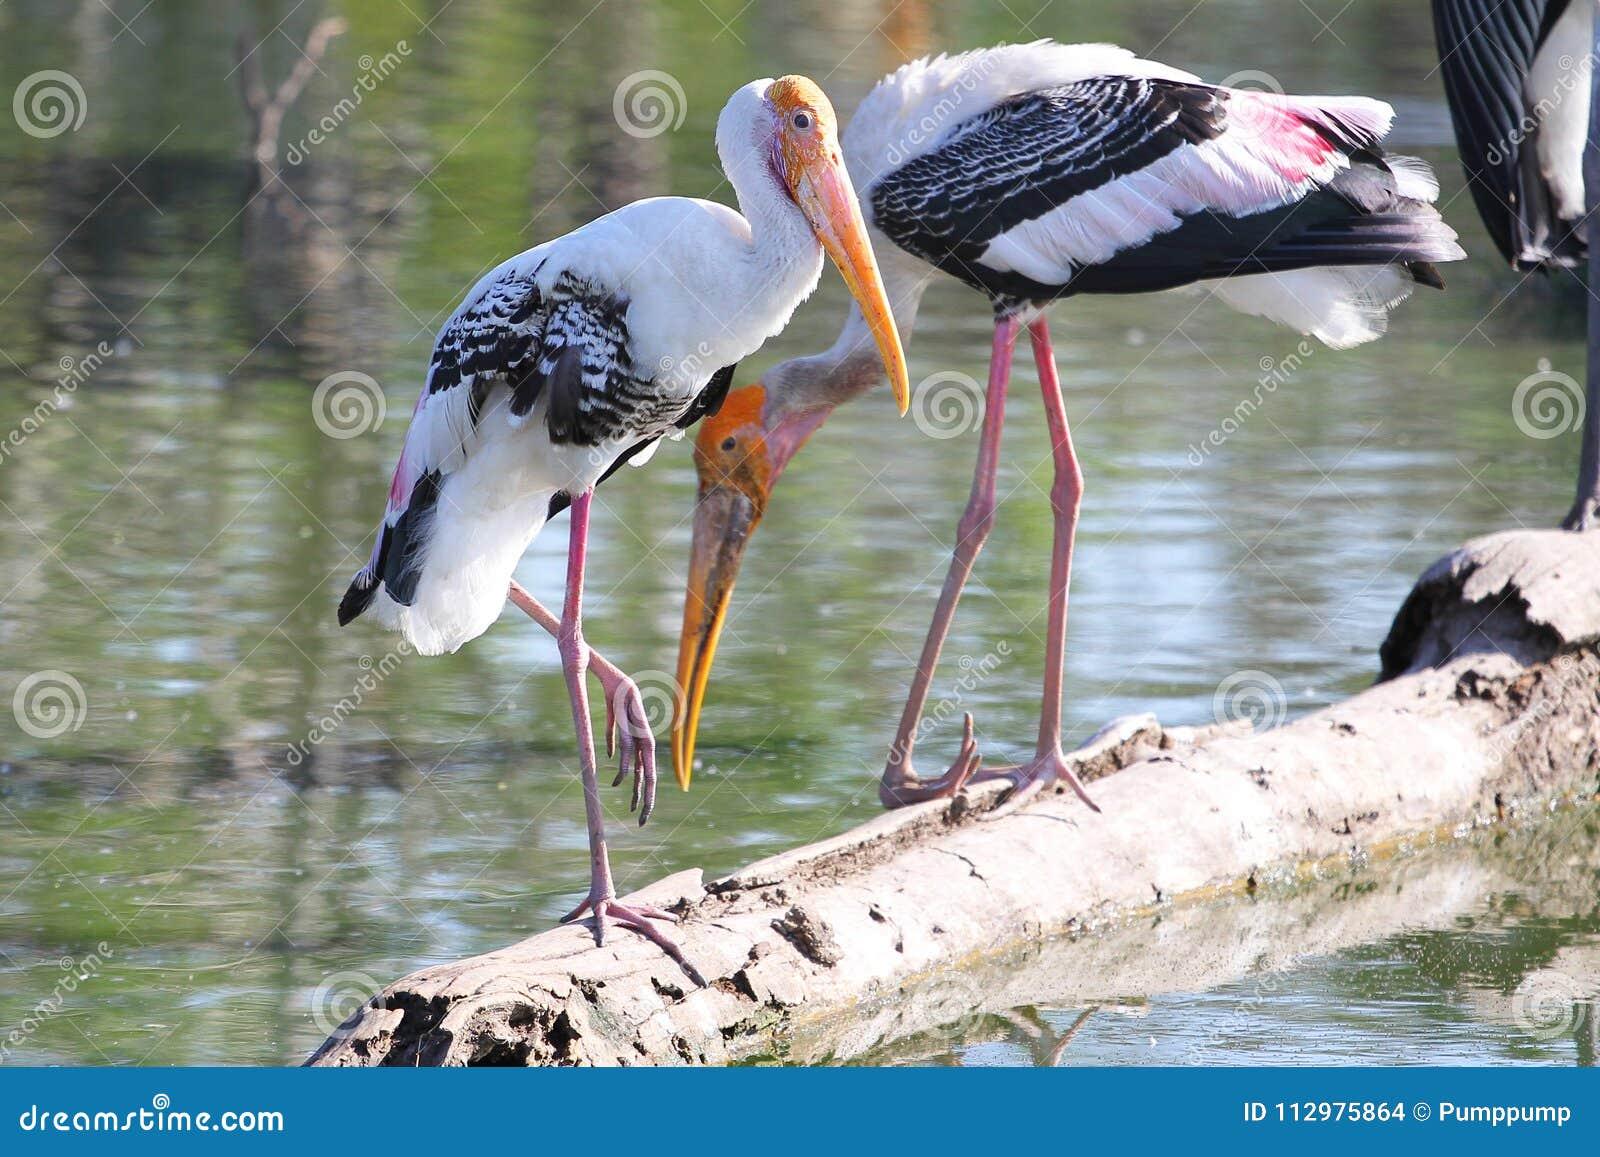 Painted Stork & x28;Mycteria leucocephala& x29; on river